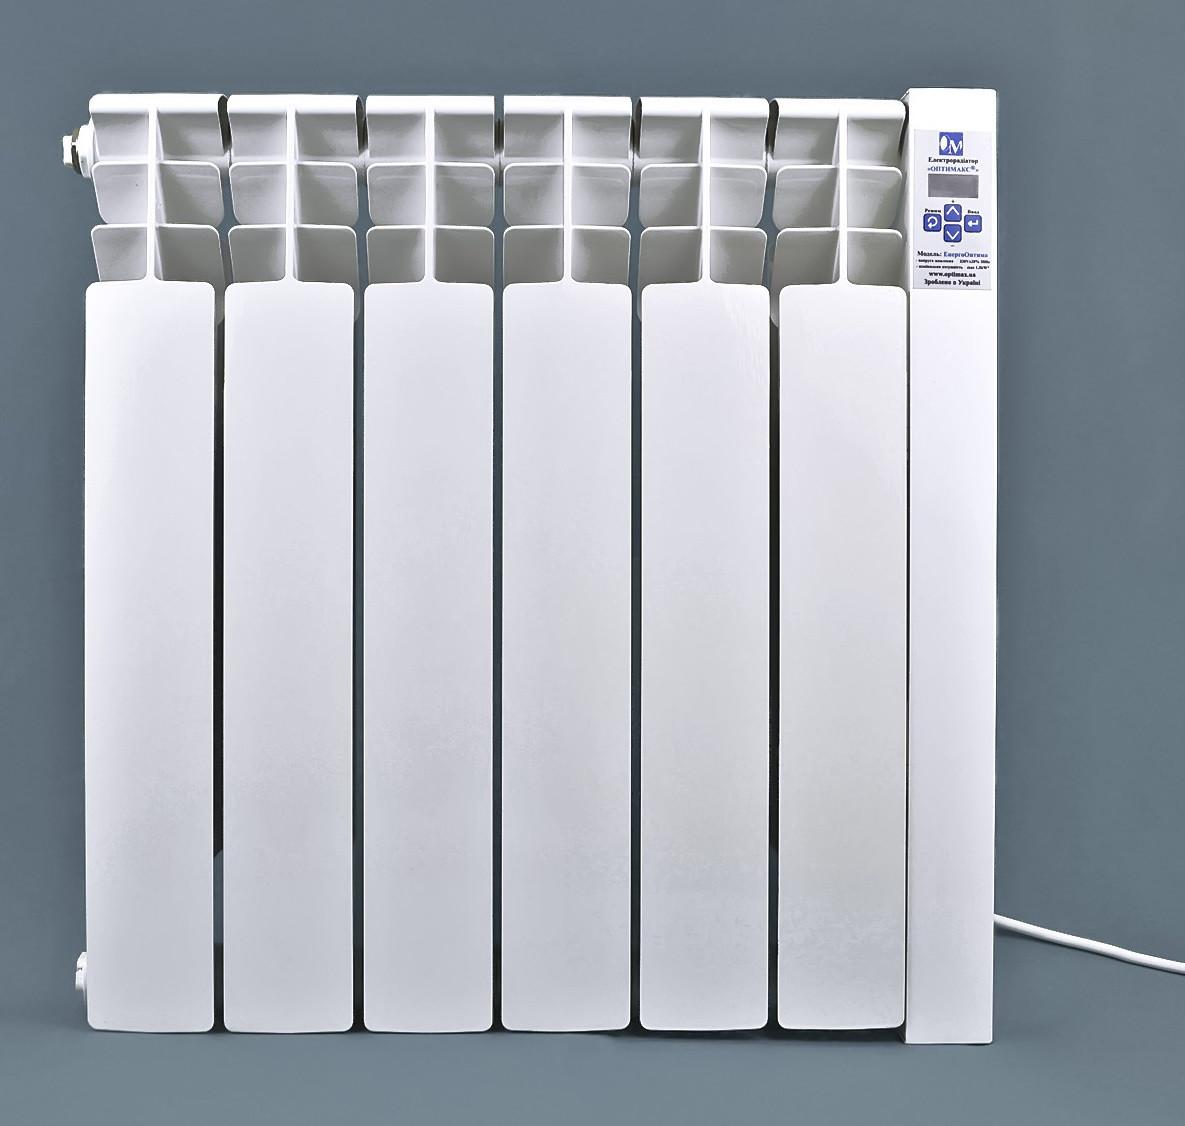 Электрический радиатор ОптиМакс STANDARD на 6 секций 720 Вт